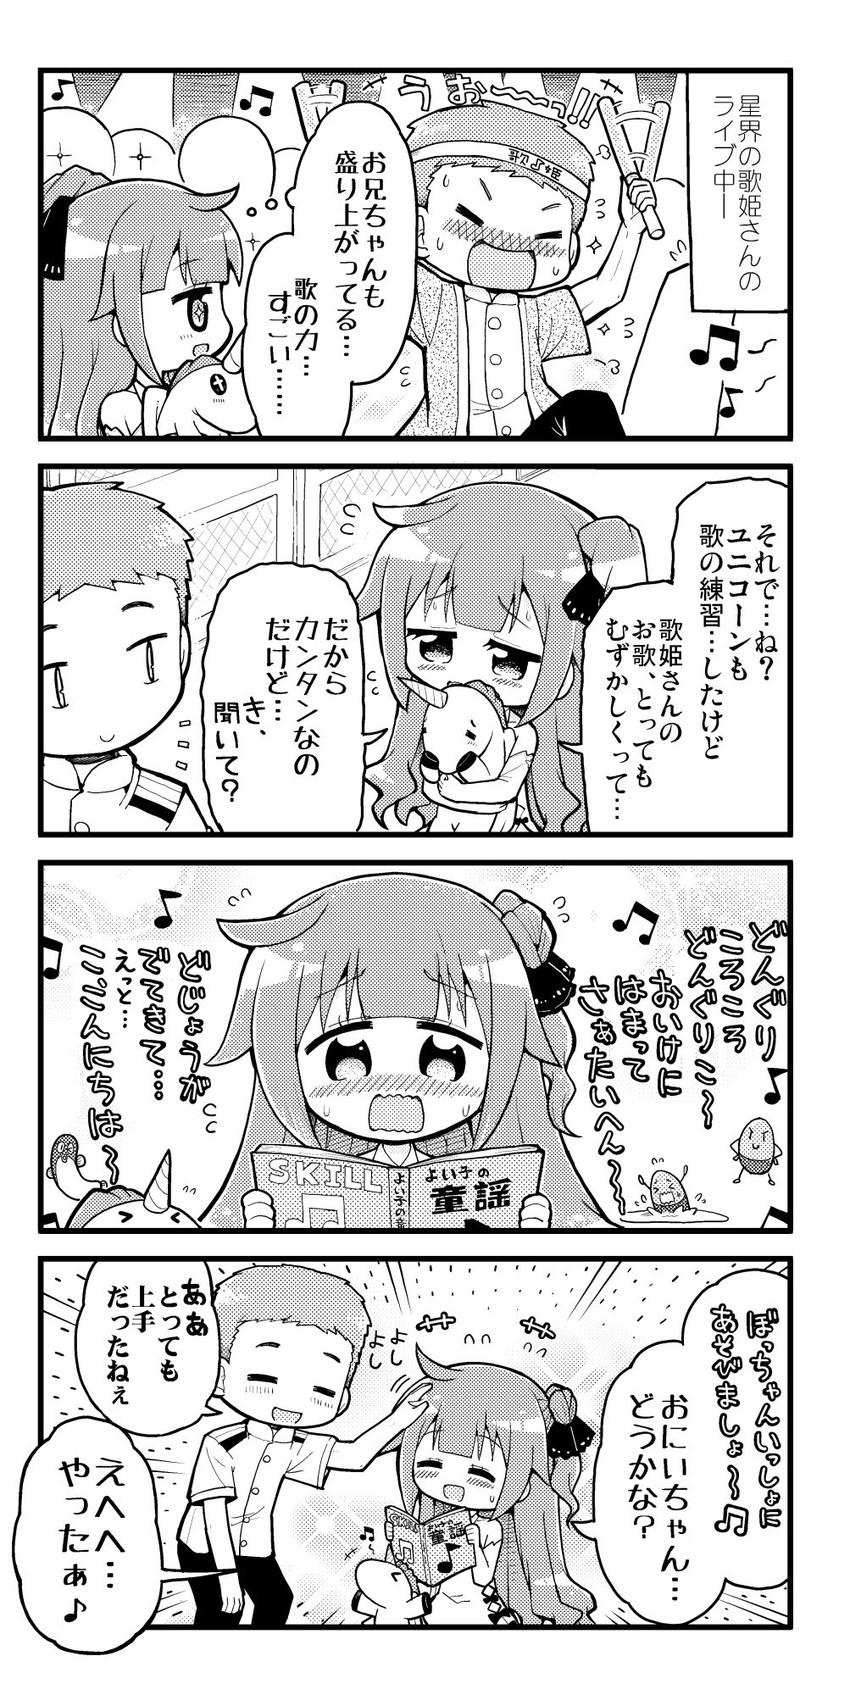 admiral and unicorn (azur lane) drawn by herada mitsuru